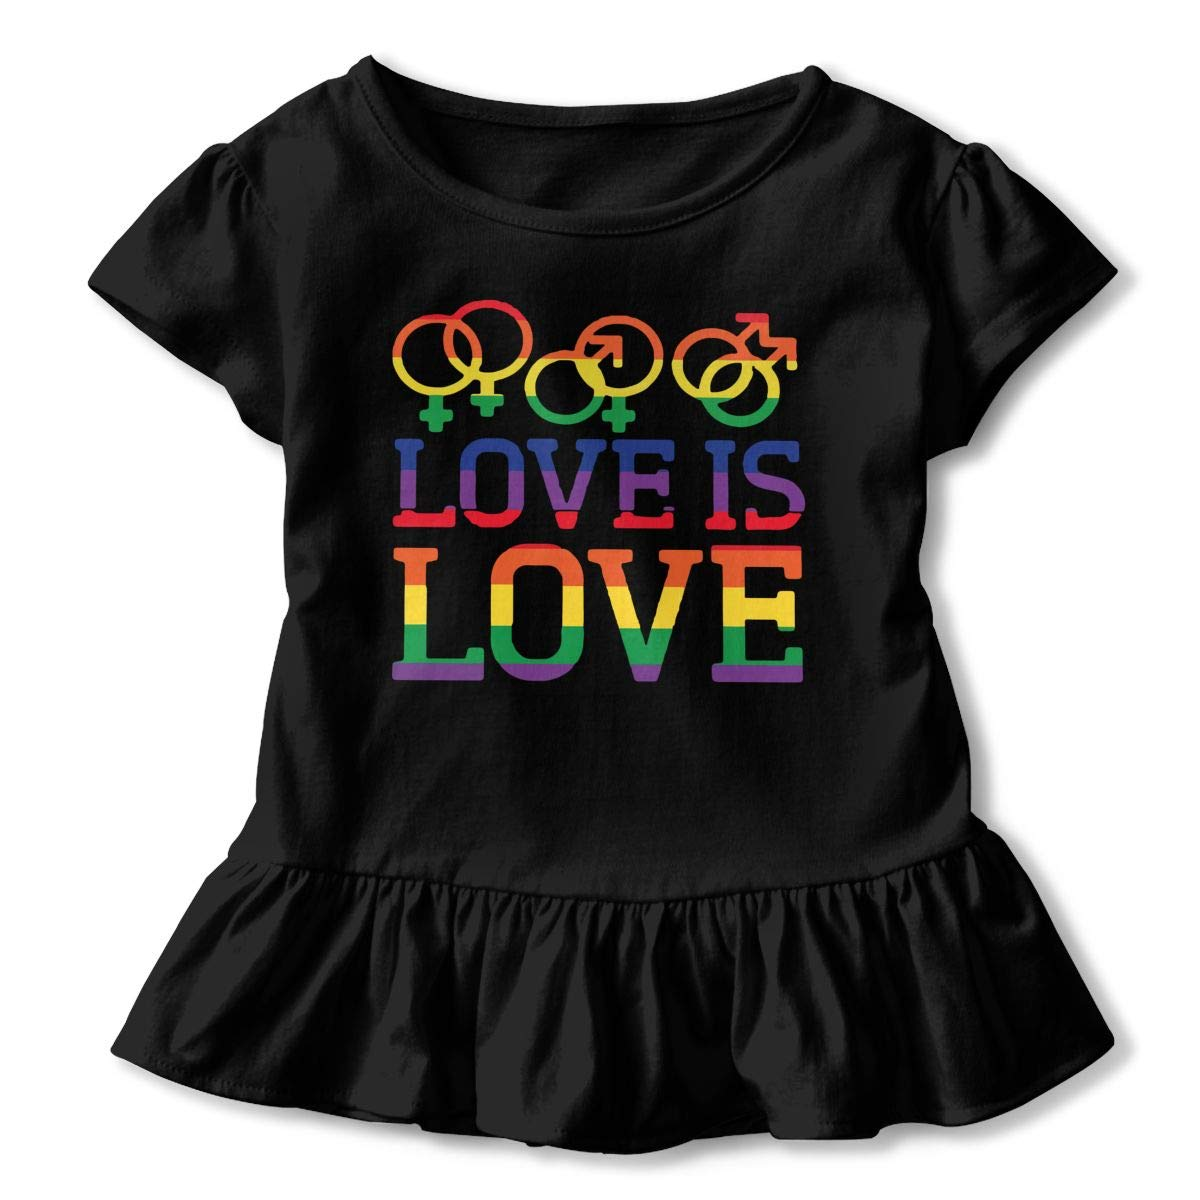 CZnuen Love is Love Rainbow Gay Lesbian Pride 2-6T Baby Girls Cotton Jersey Short Sleeve Ruffle Tee